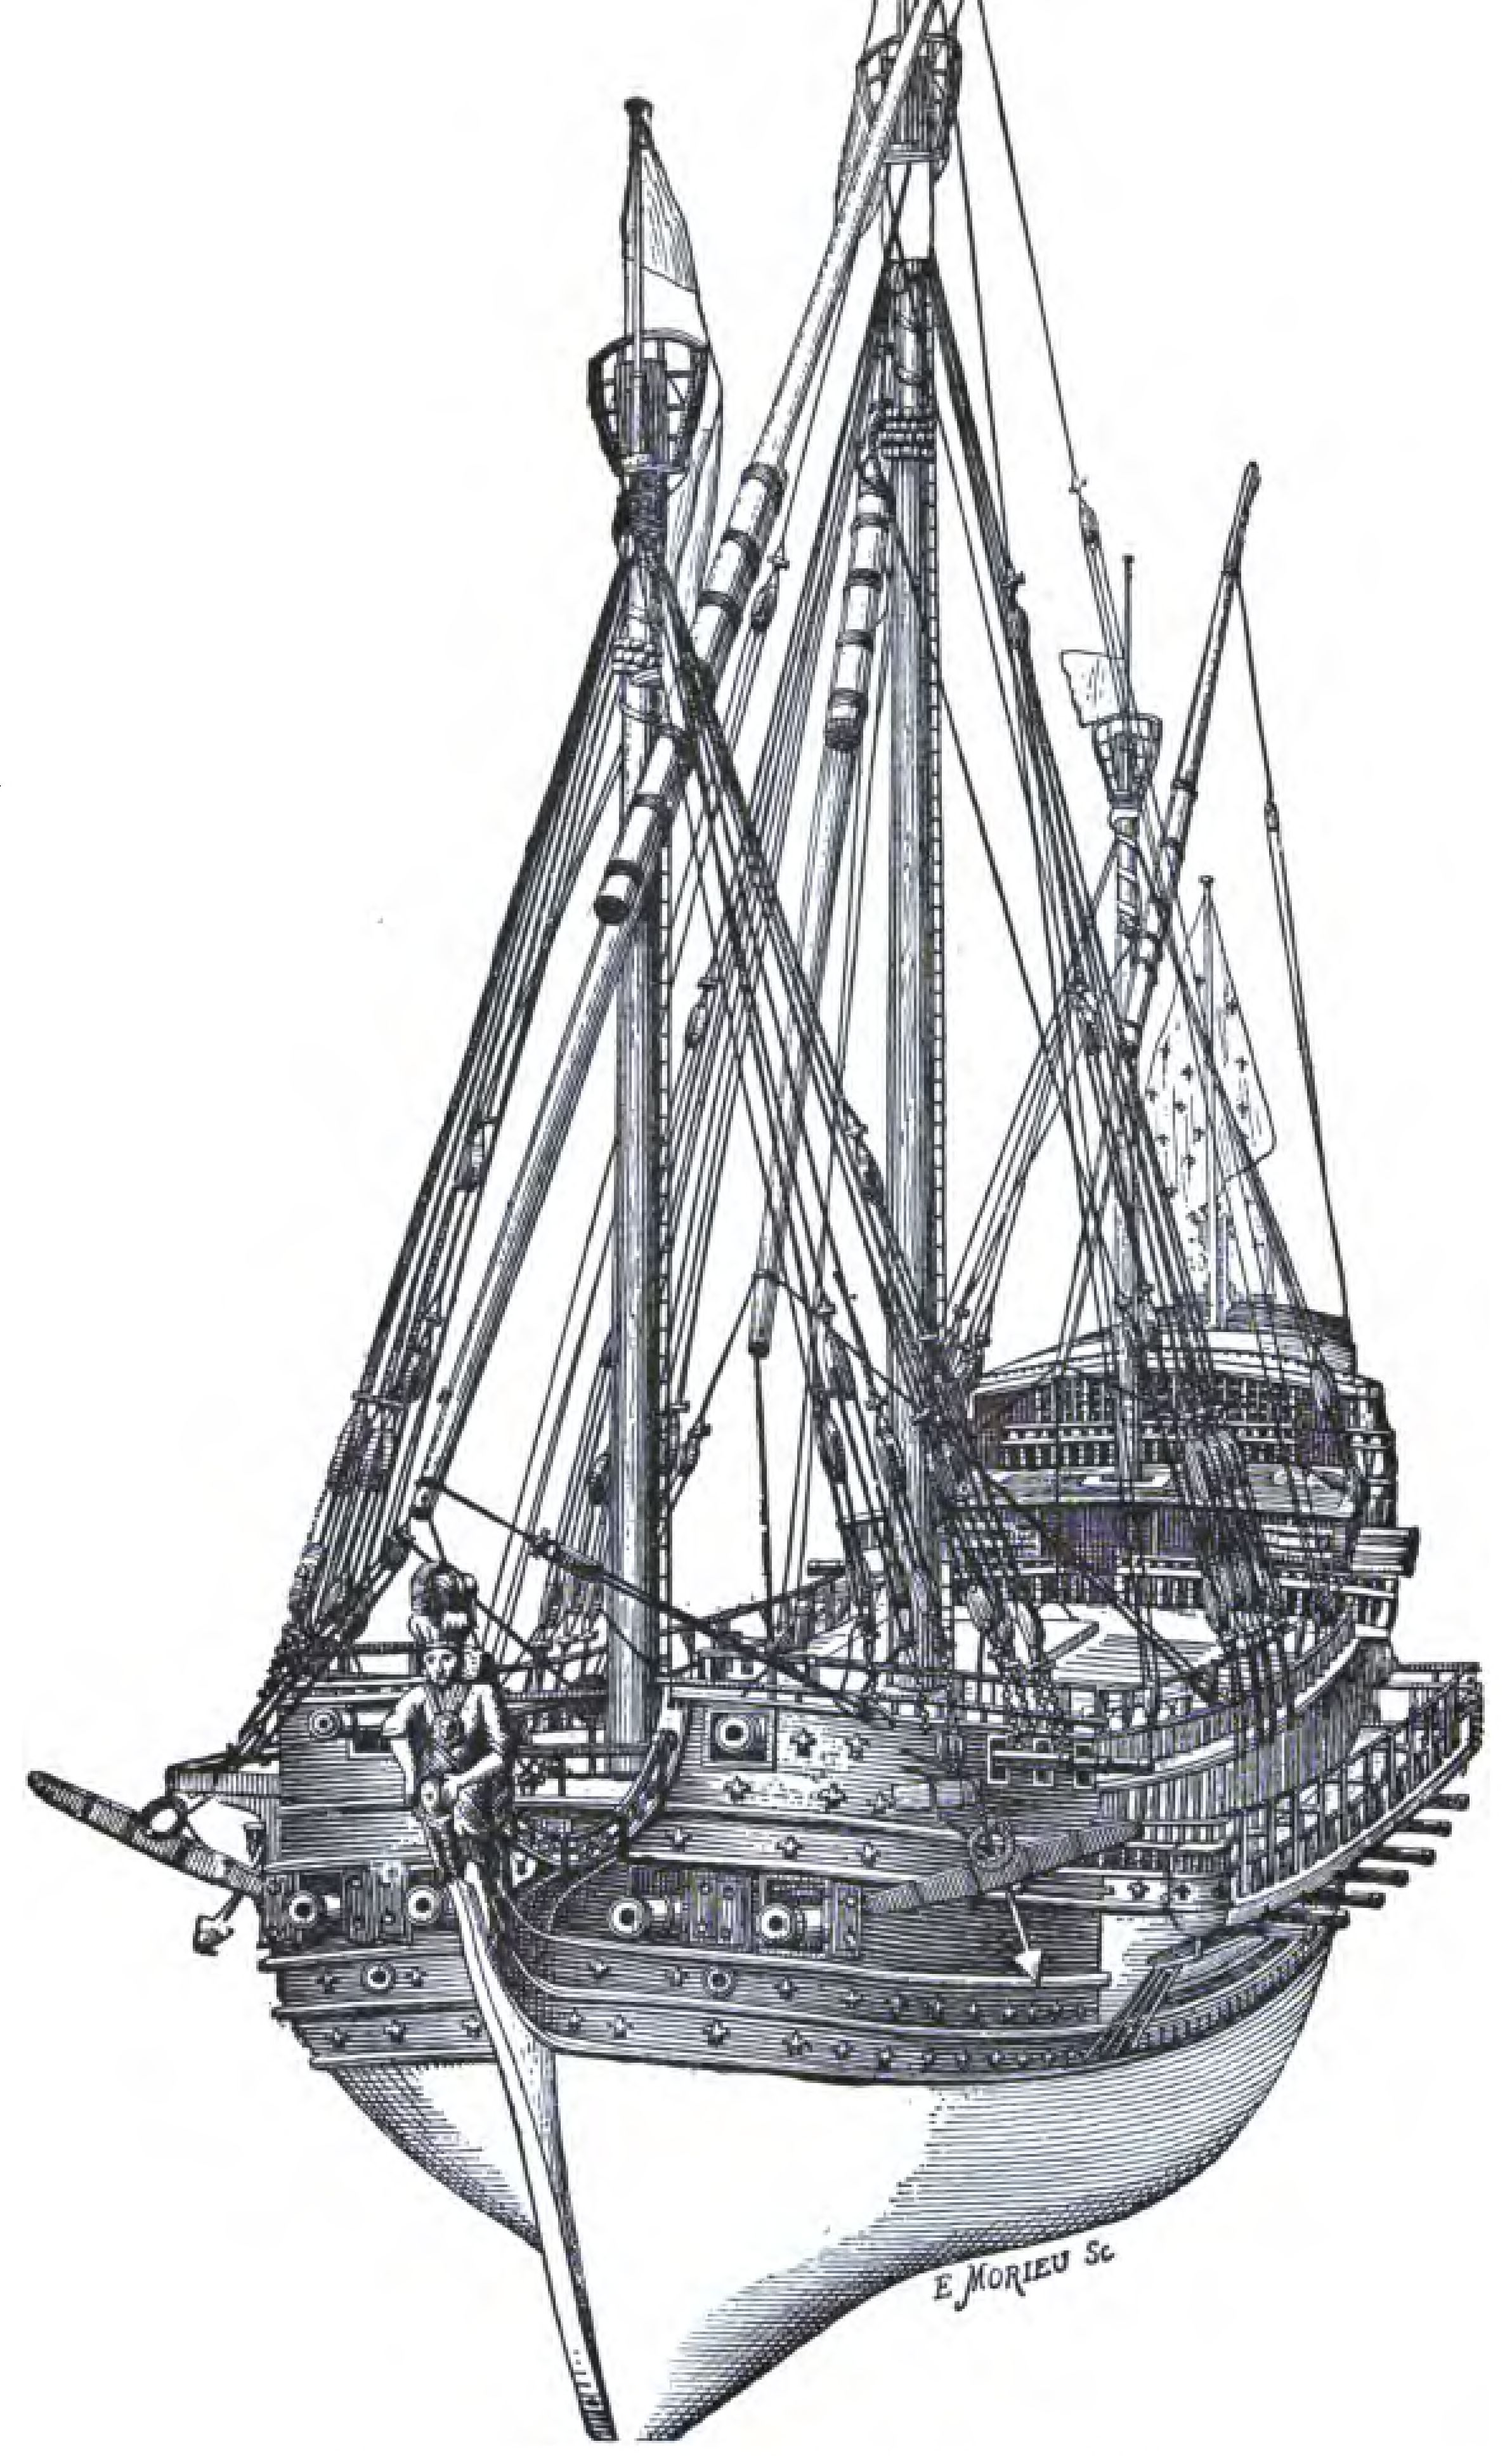 https://upload.wikimedia.org/wikipedia/commons/e/e1/17th_century_galleass.jpg